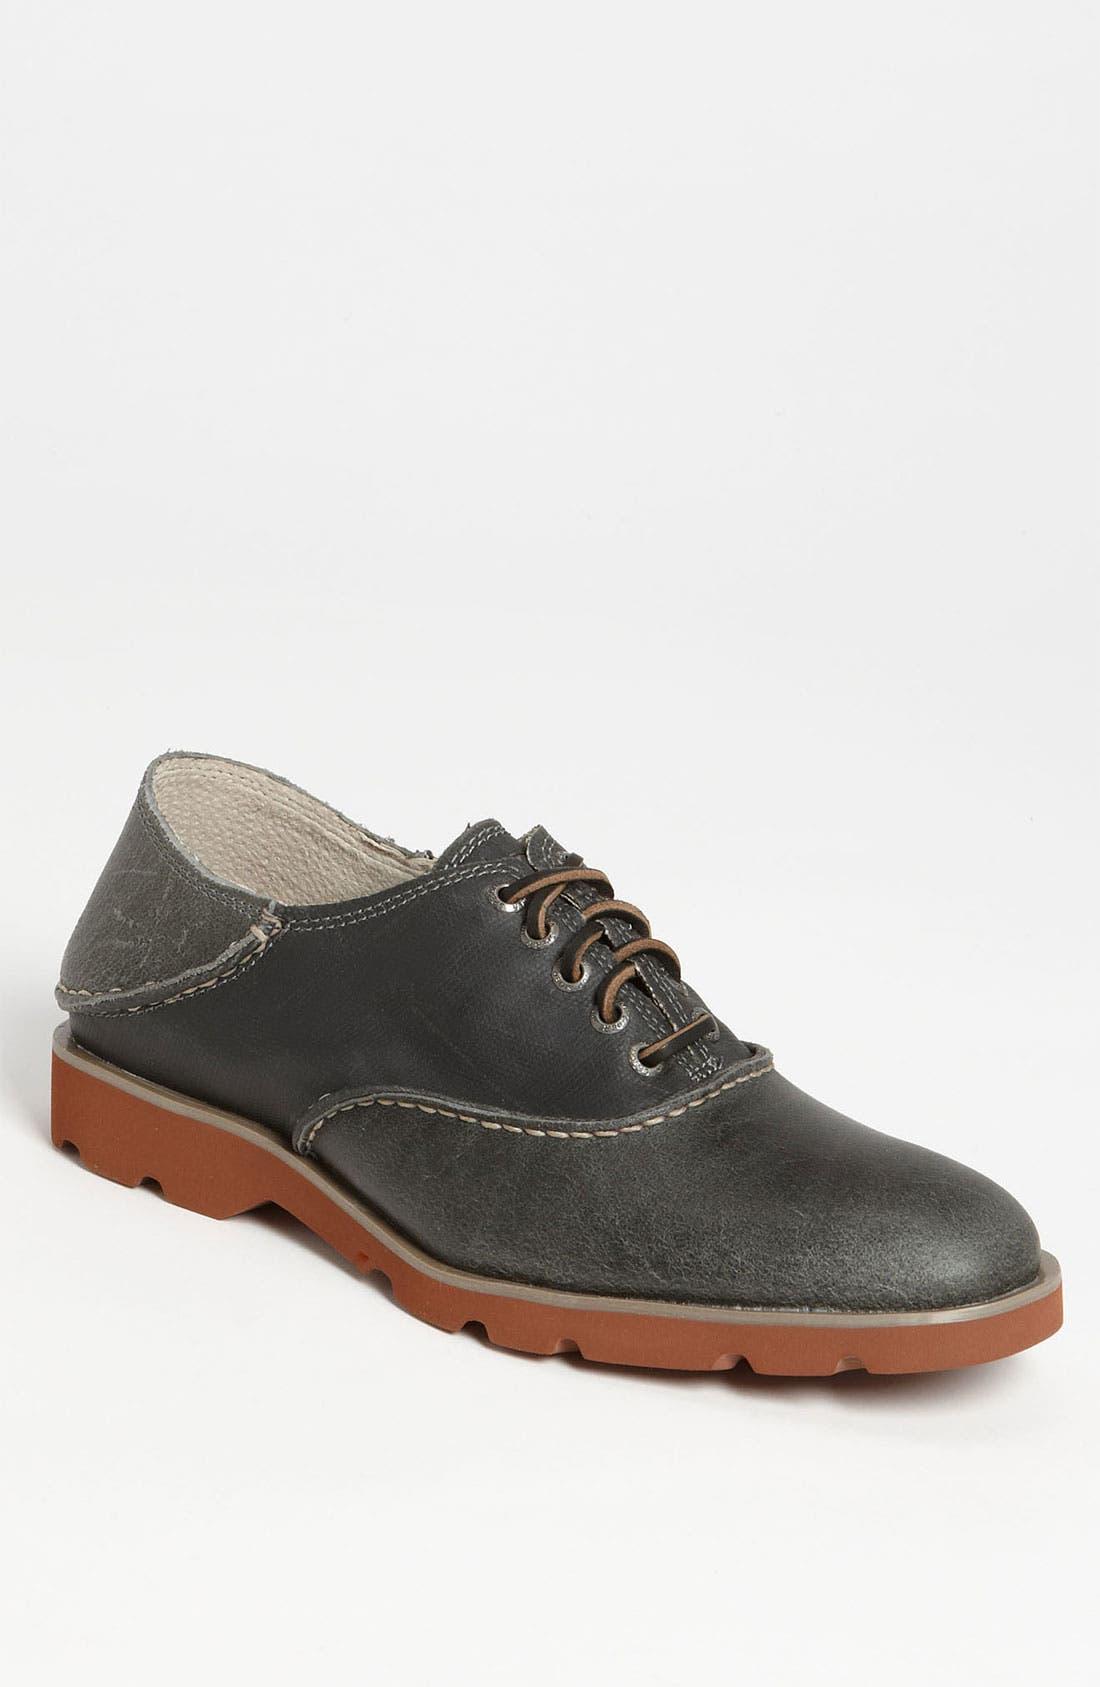 Main Image - Sperry Top-Sider® Herringbone Saddle Shoe